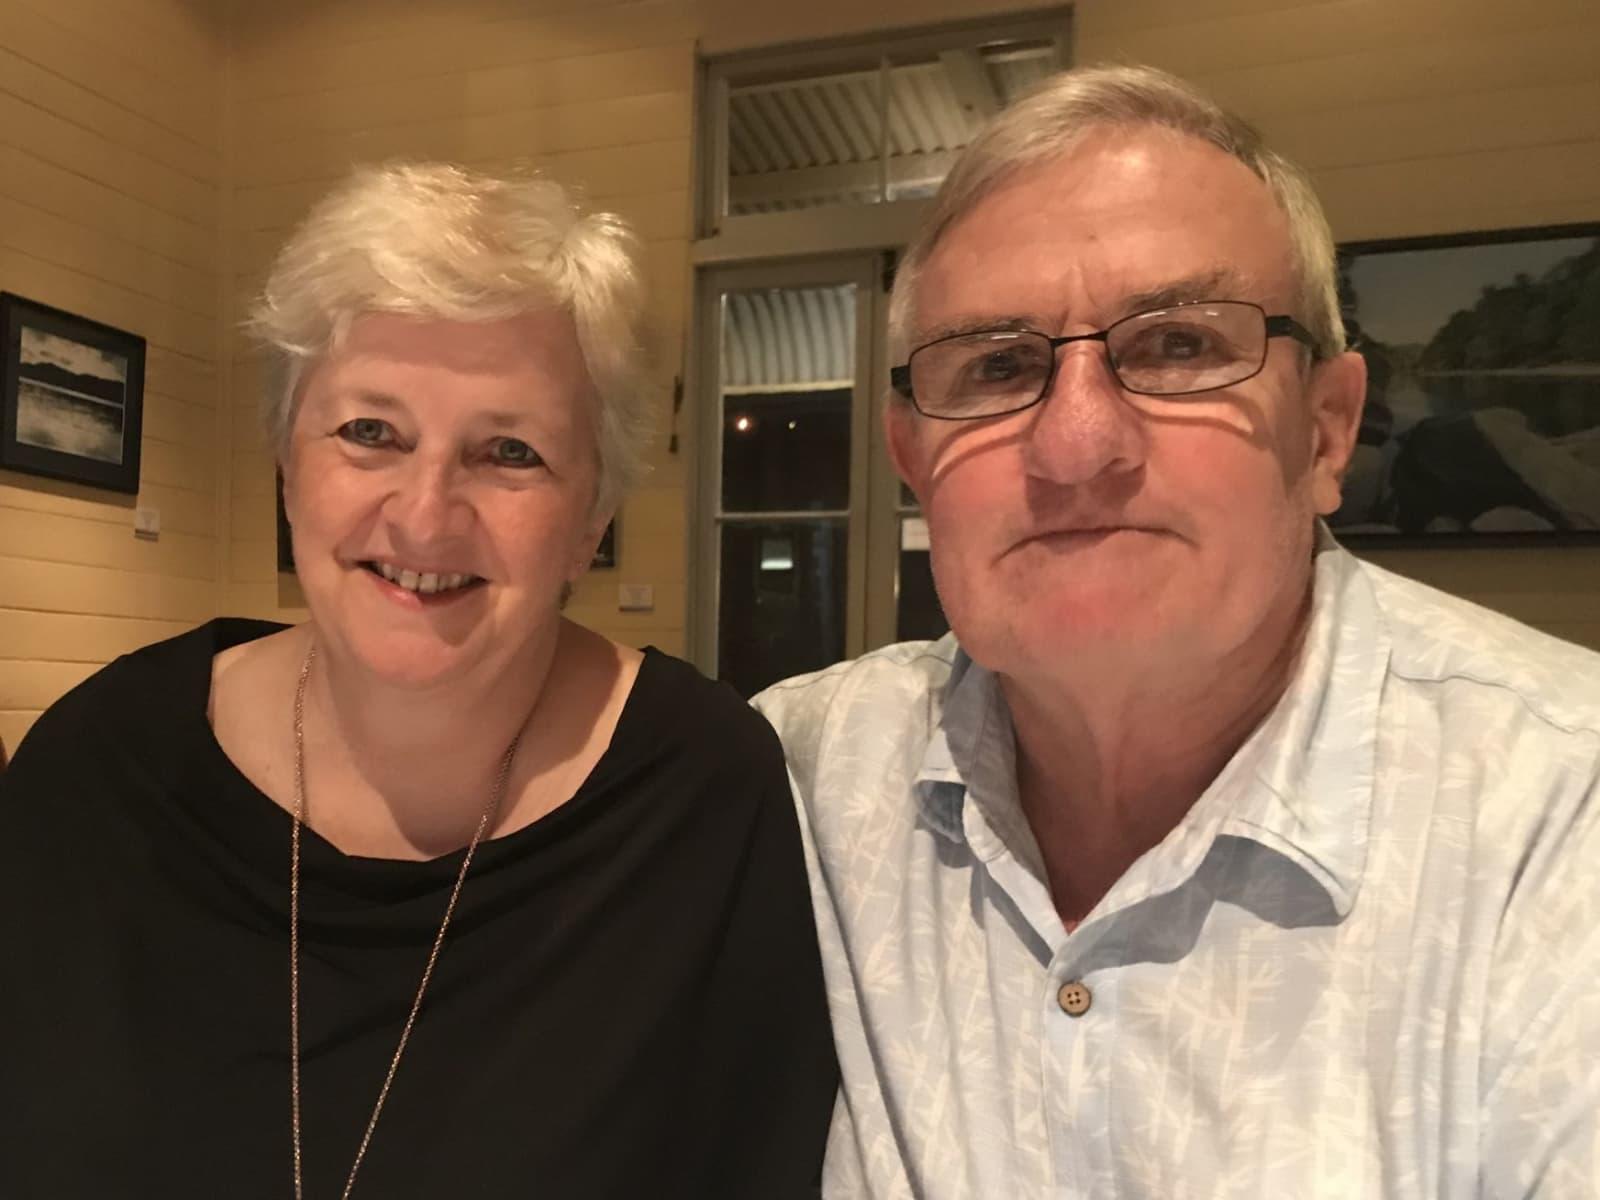 Debra & Simon from Herberton, Queensland, Australia